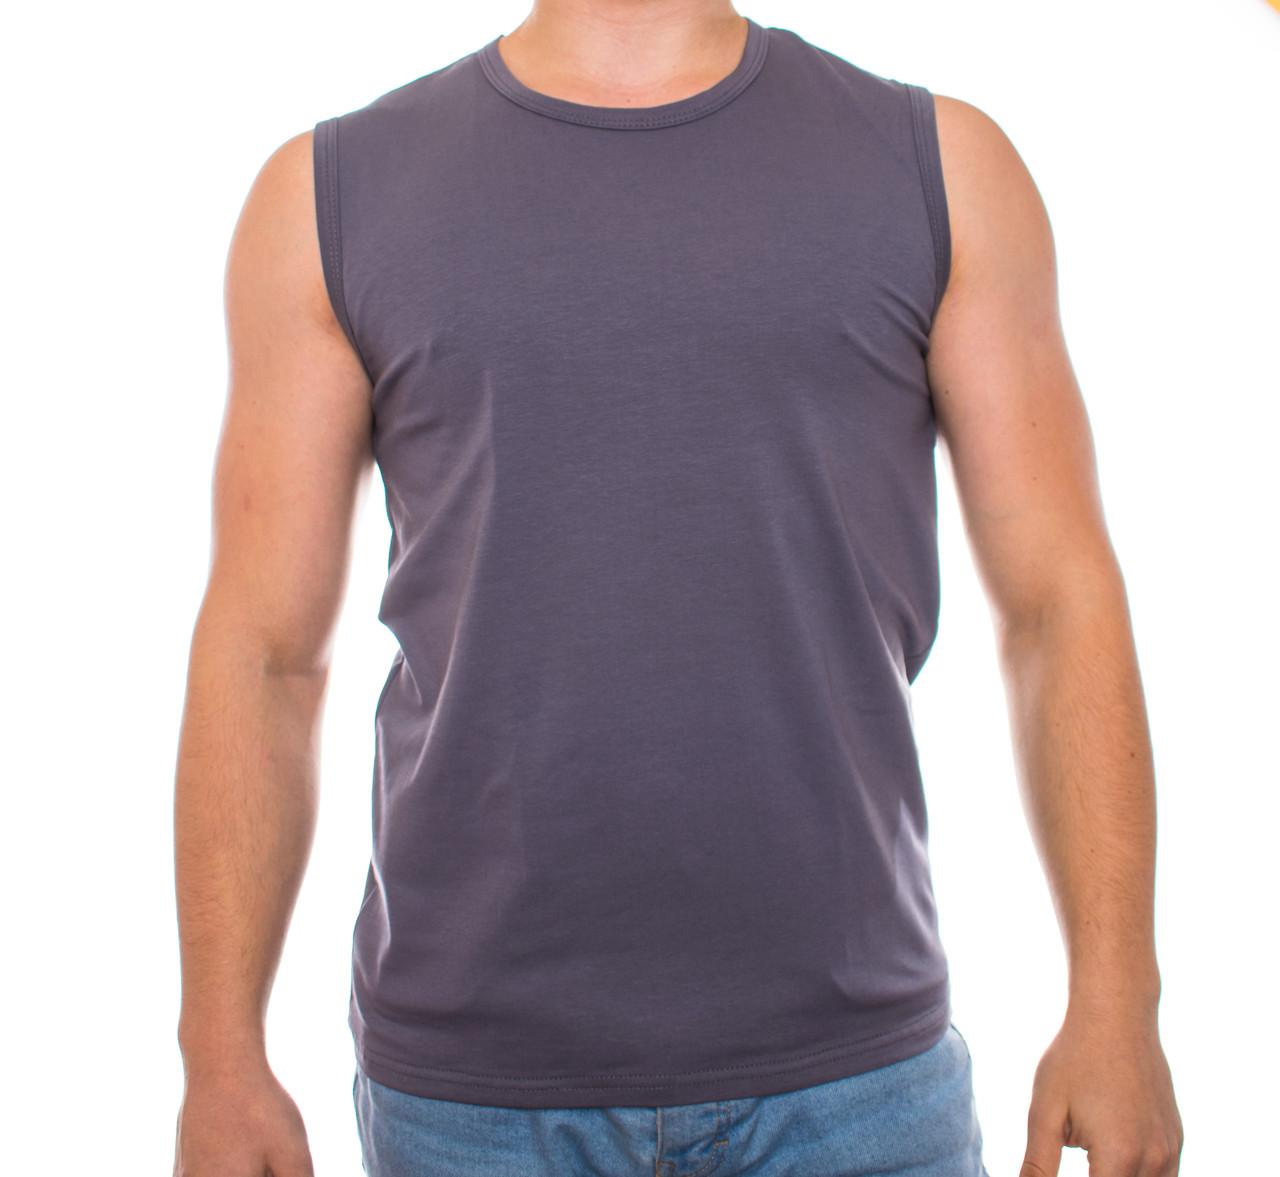 Мужская футболка без рукавов Bono 950120